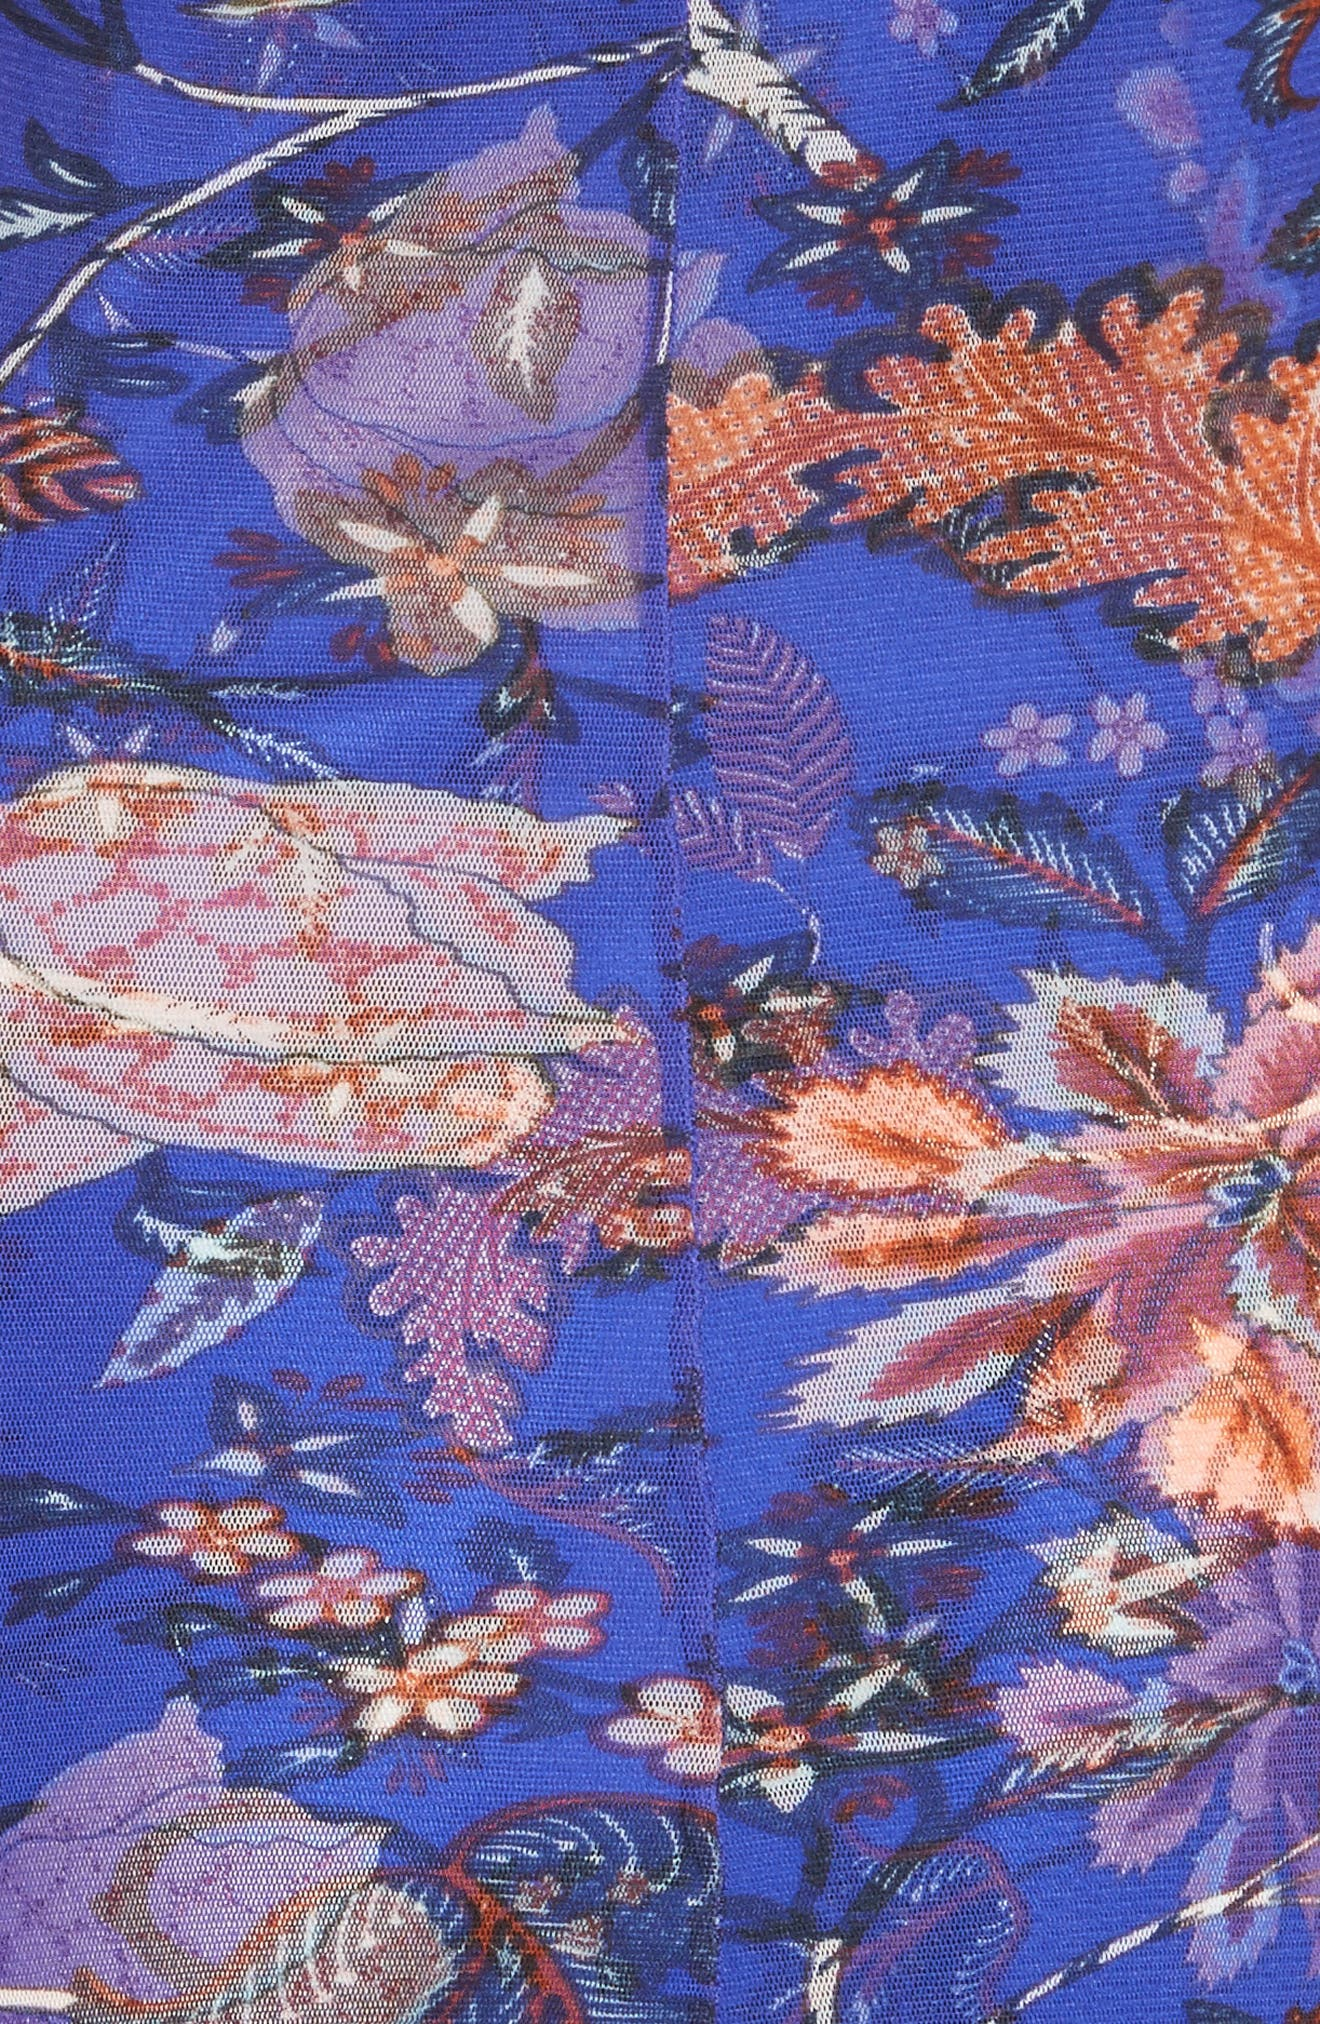 Diane von Furstenberg Mesh Overlay Floral Midi Dress,                             Alternate thumbnail 5, color,                             533